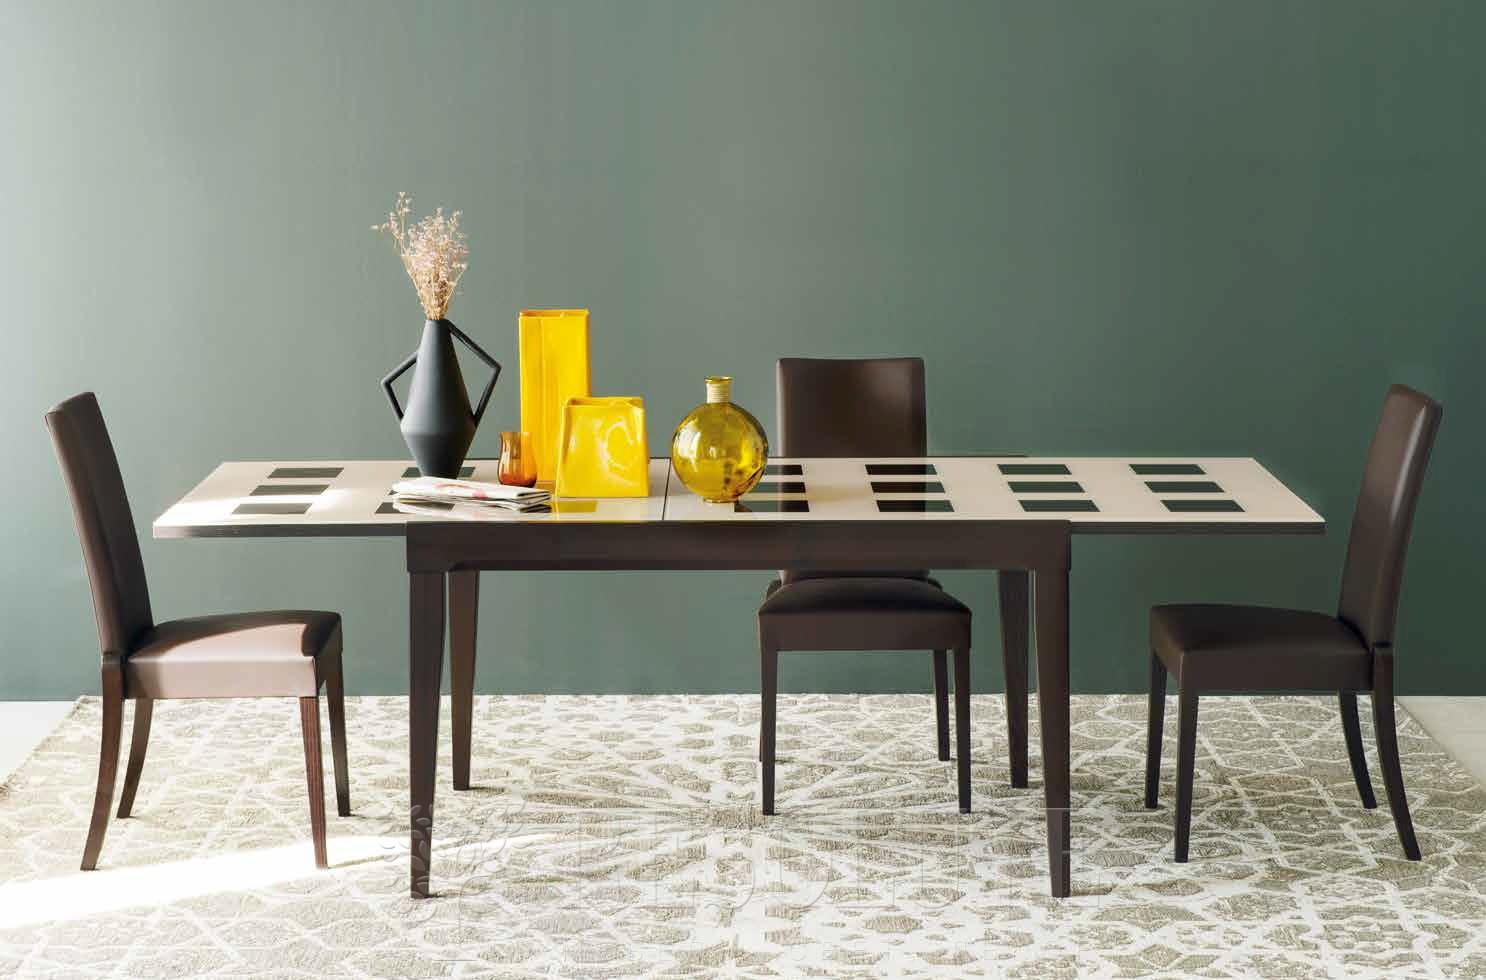 Стол деревянный со стеклом Connubiai CB/4702-Q130 Fly Checkers - 1